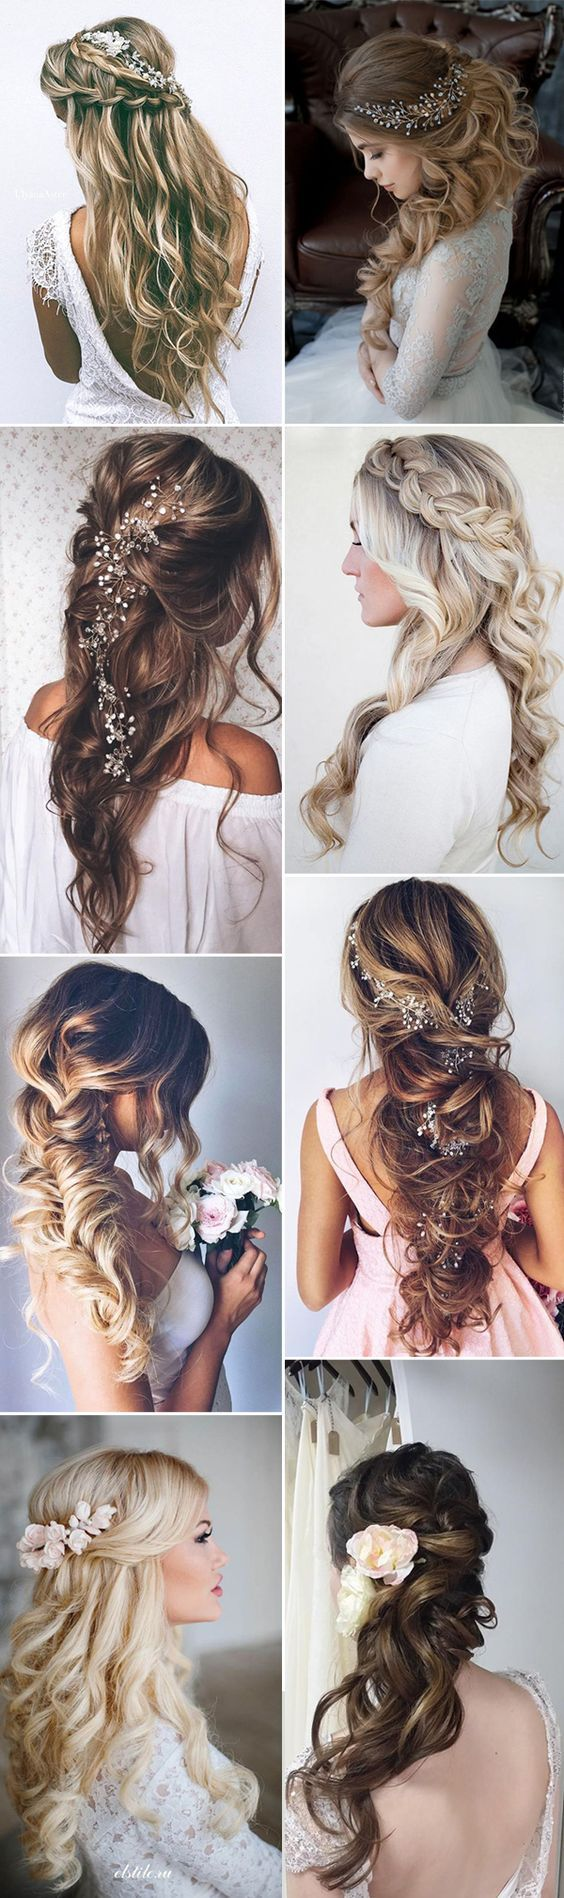 best 25+ curly bridal hair ideas on pinterest | vintage bridal